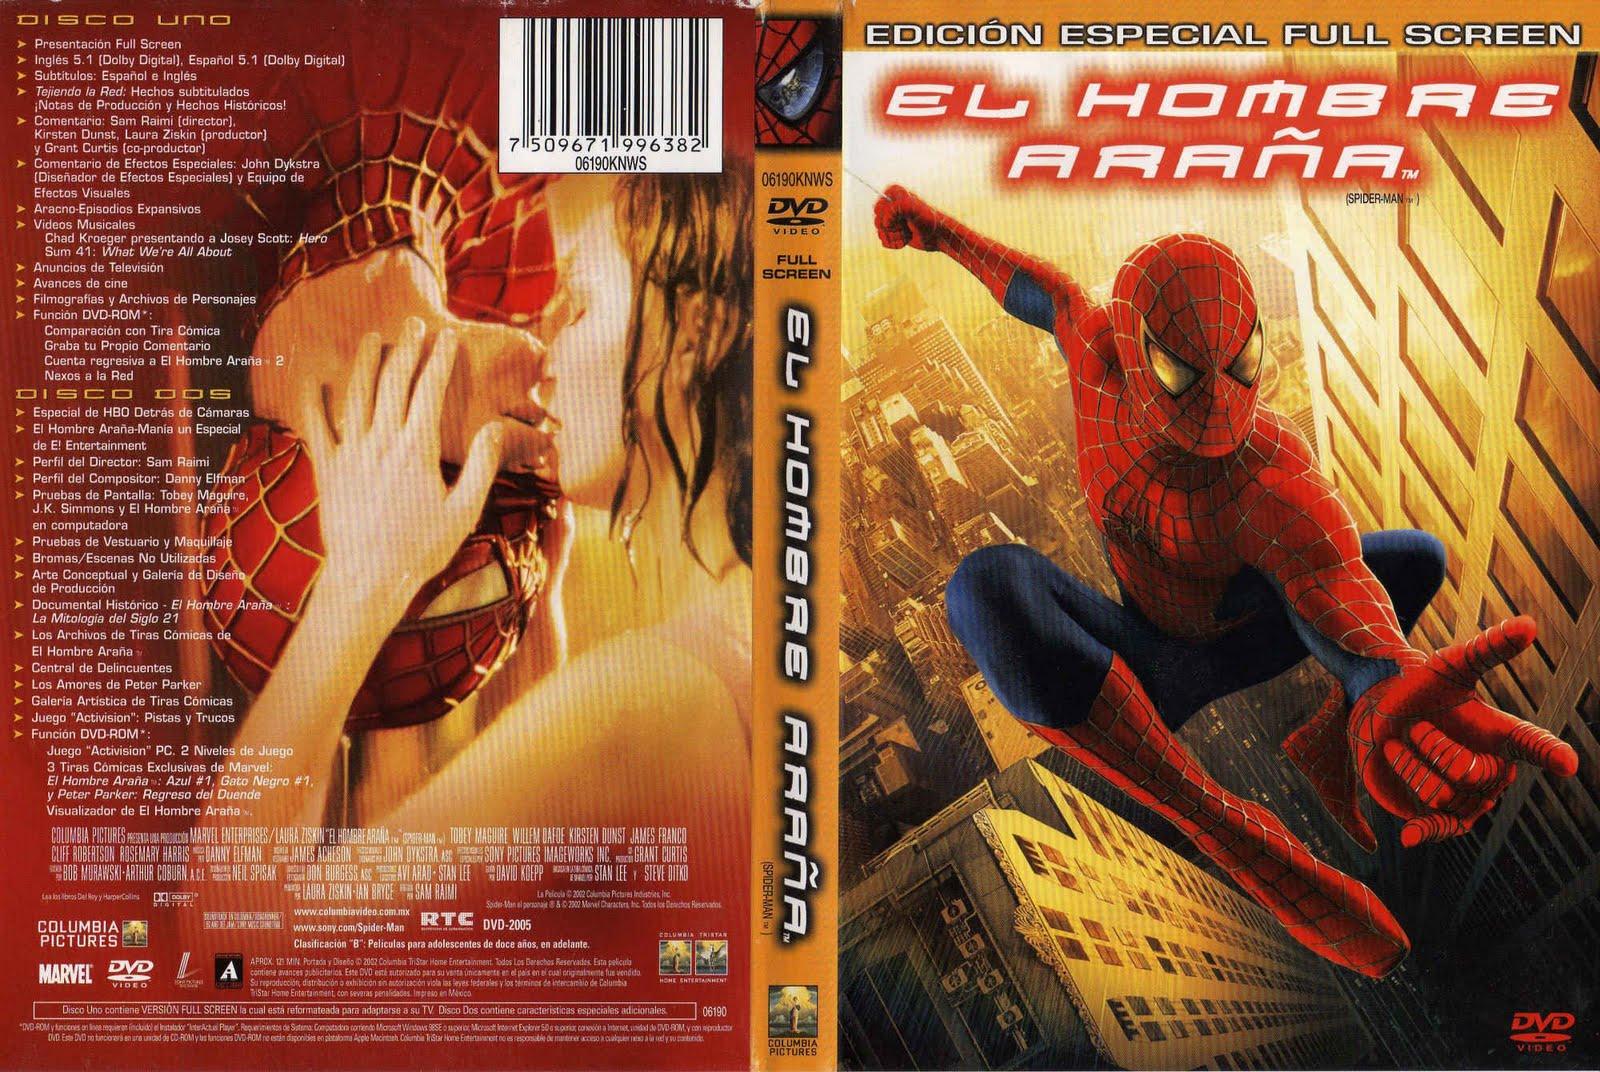 http://1.bp.blogspot.com/-krbaXuwuuFc/TcoYji7A5zI/AAAAAAAAALI/m0vbrT0yovk/s1600/0072+-+Spiderman_-_El_Hombre_Arana_-_Region_4_por_Hersal.jpg